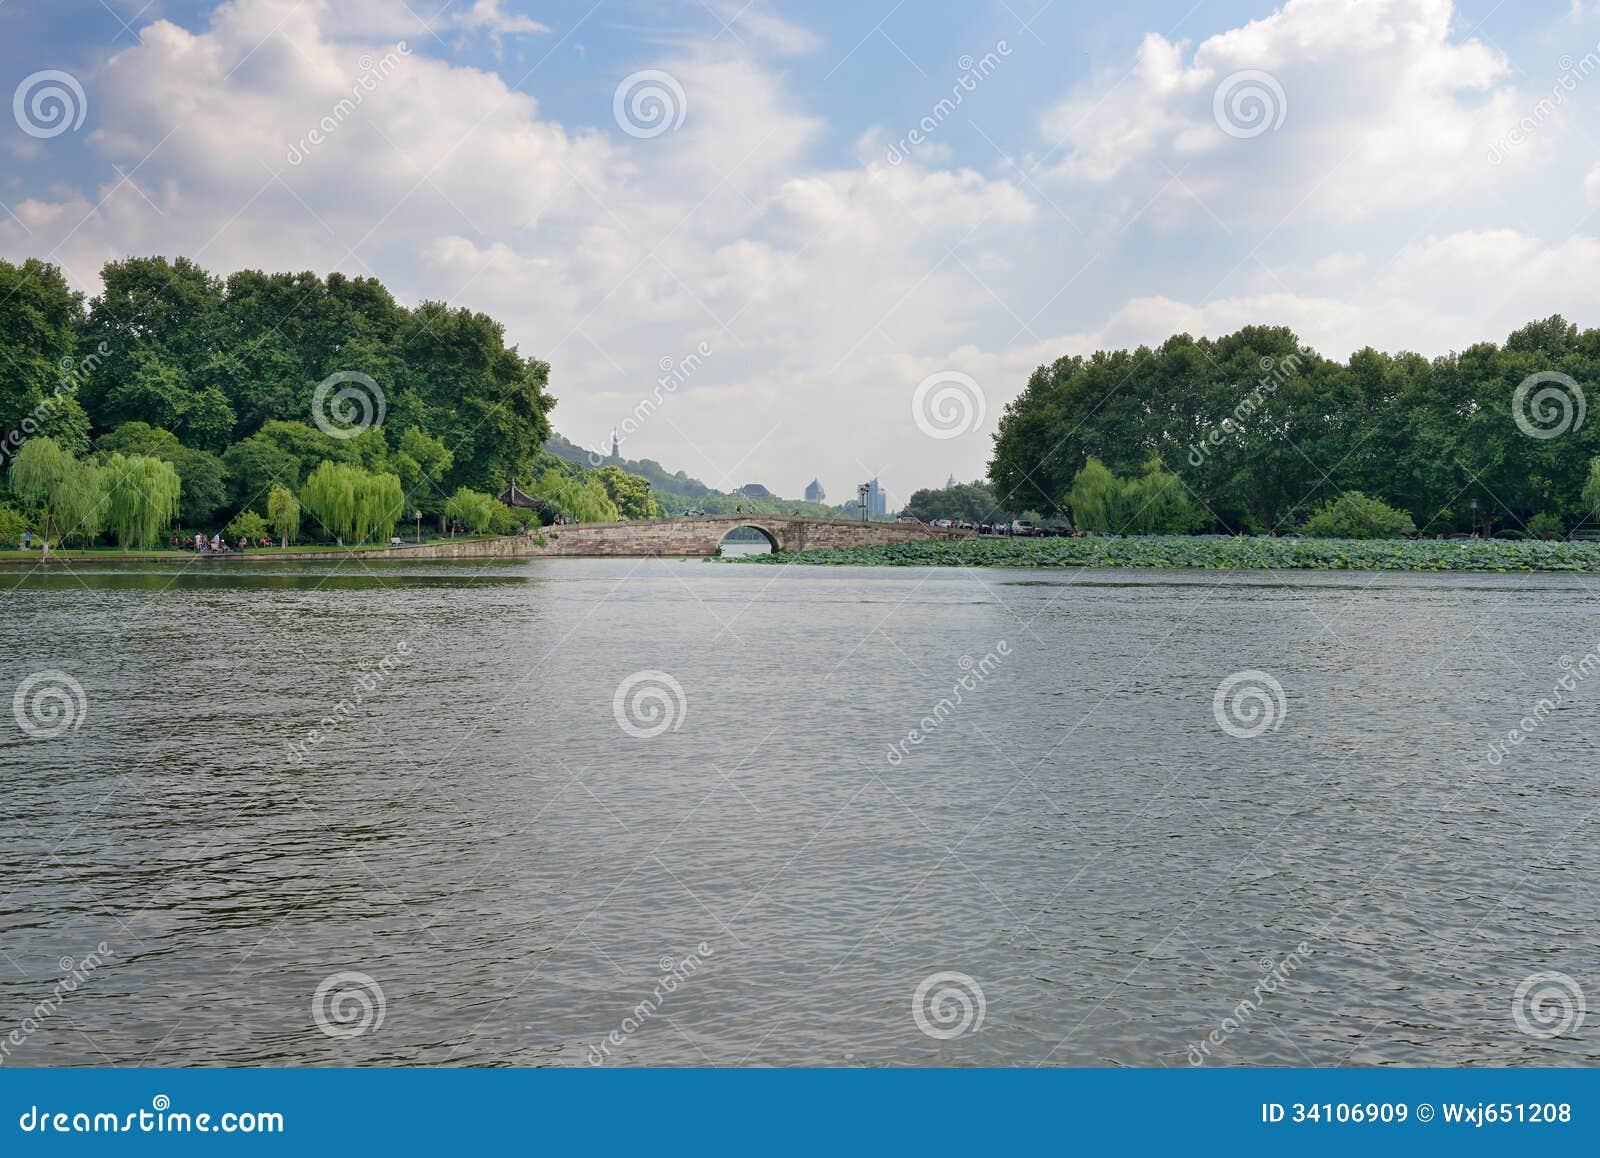 West Lake Scenery Stock Image  Image Of Trees  Boats